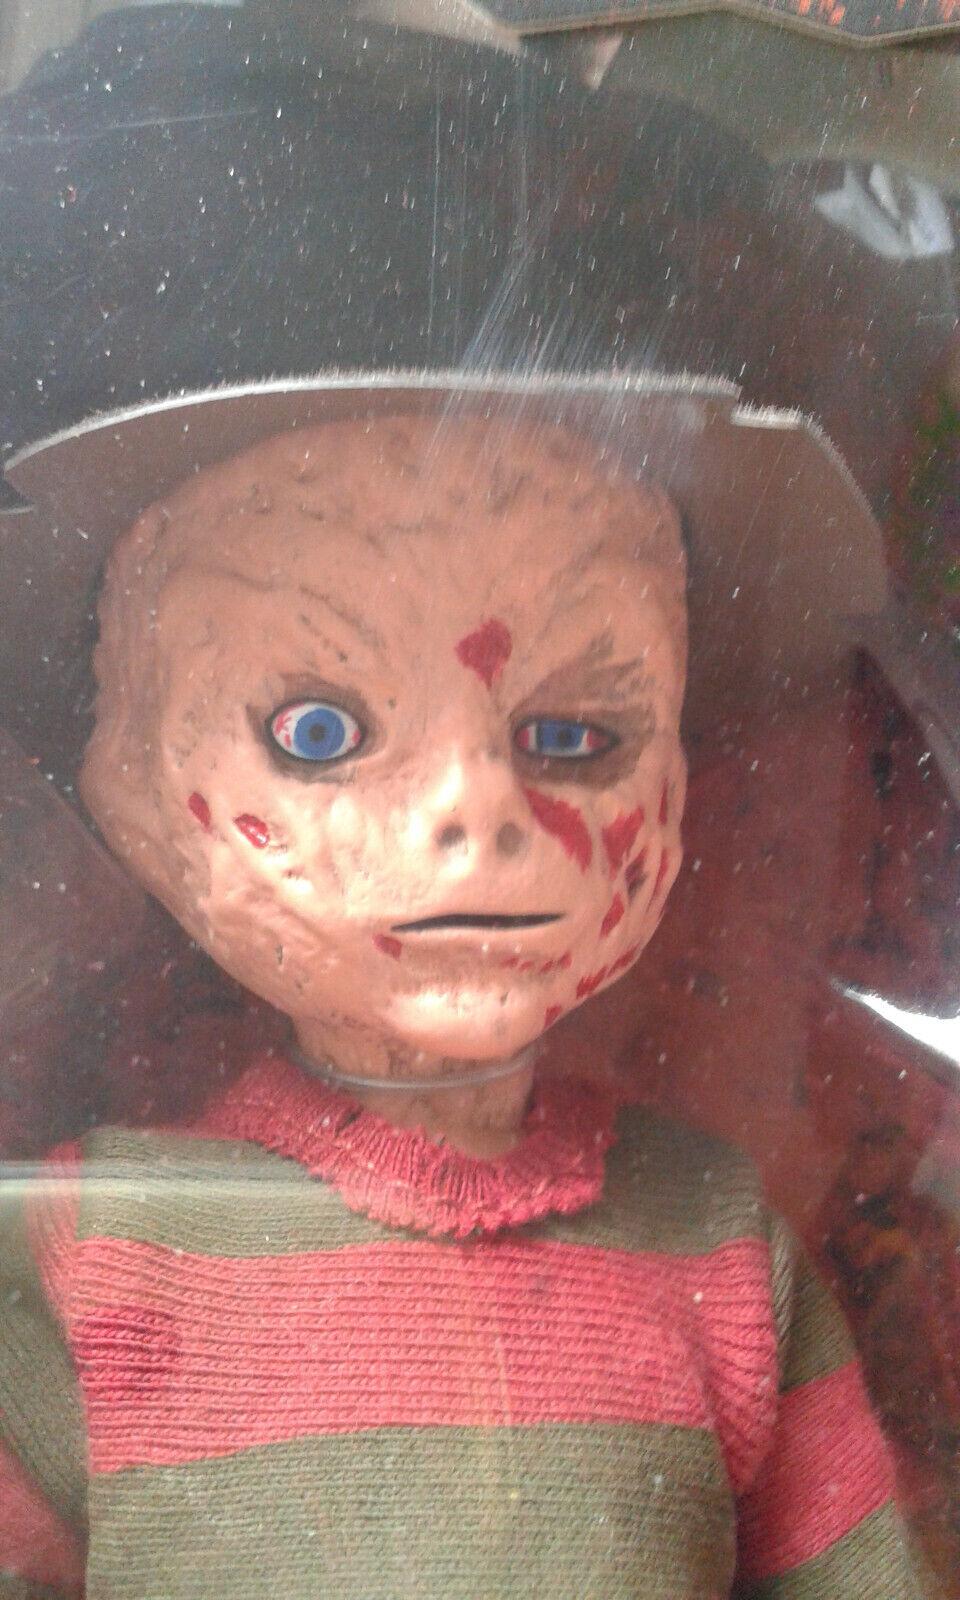 distribuzione globale LIVING DEAD bambolaS LDD LDD LDD Presents  Frossody Krueger-A Nightmare on Elm Street 2010  risparmia fino al 50%